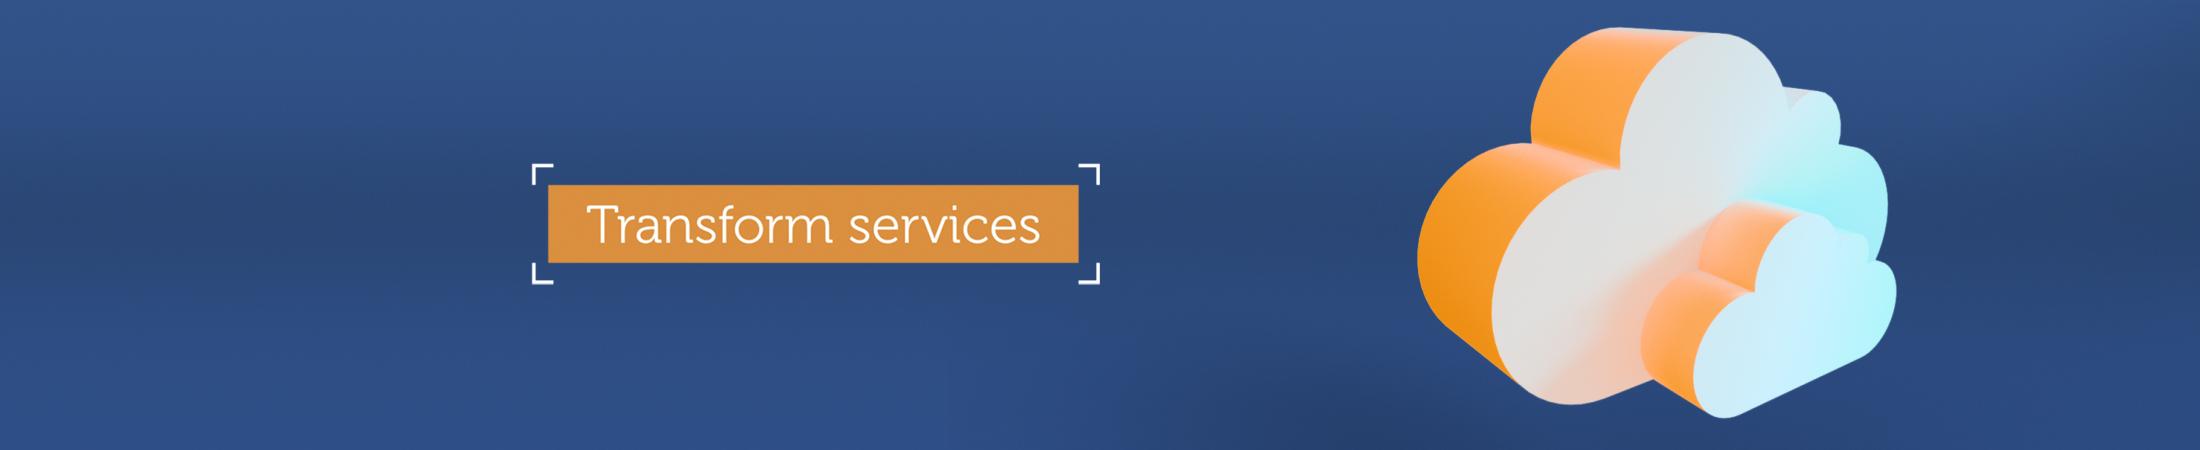 Transform digital services mobilebanner